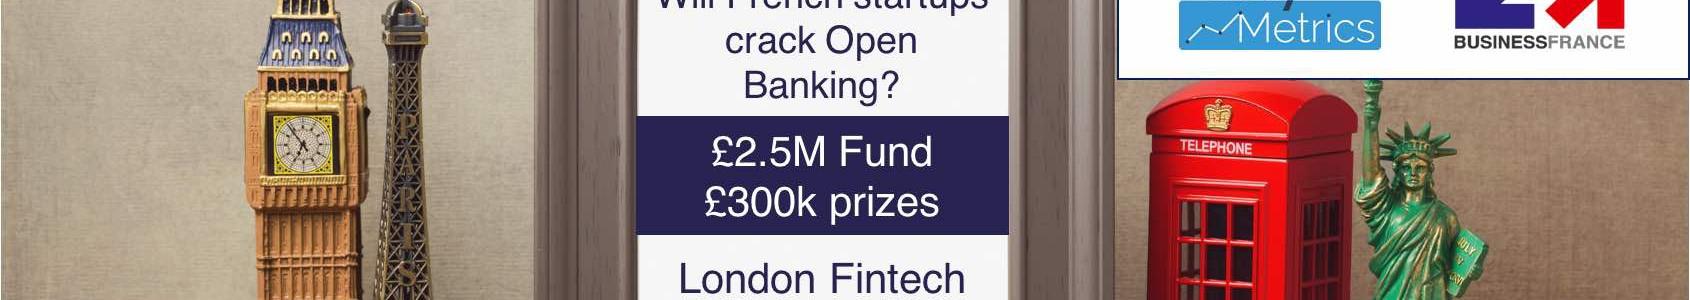 Open banking_Nesta_challenge